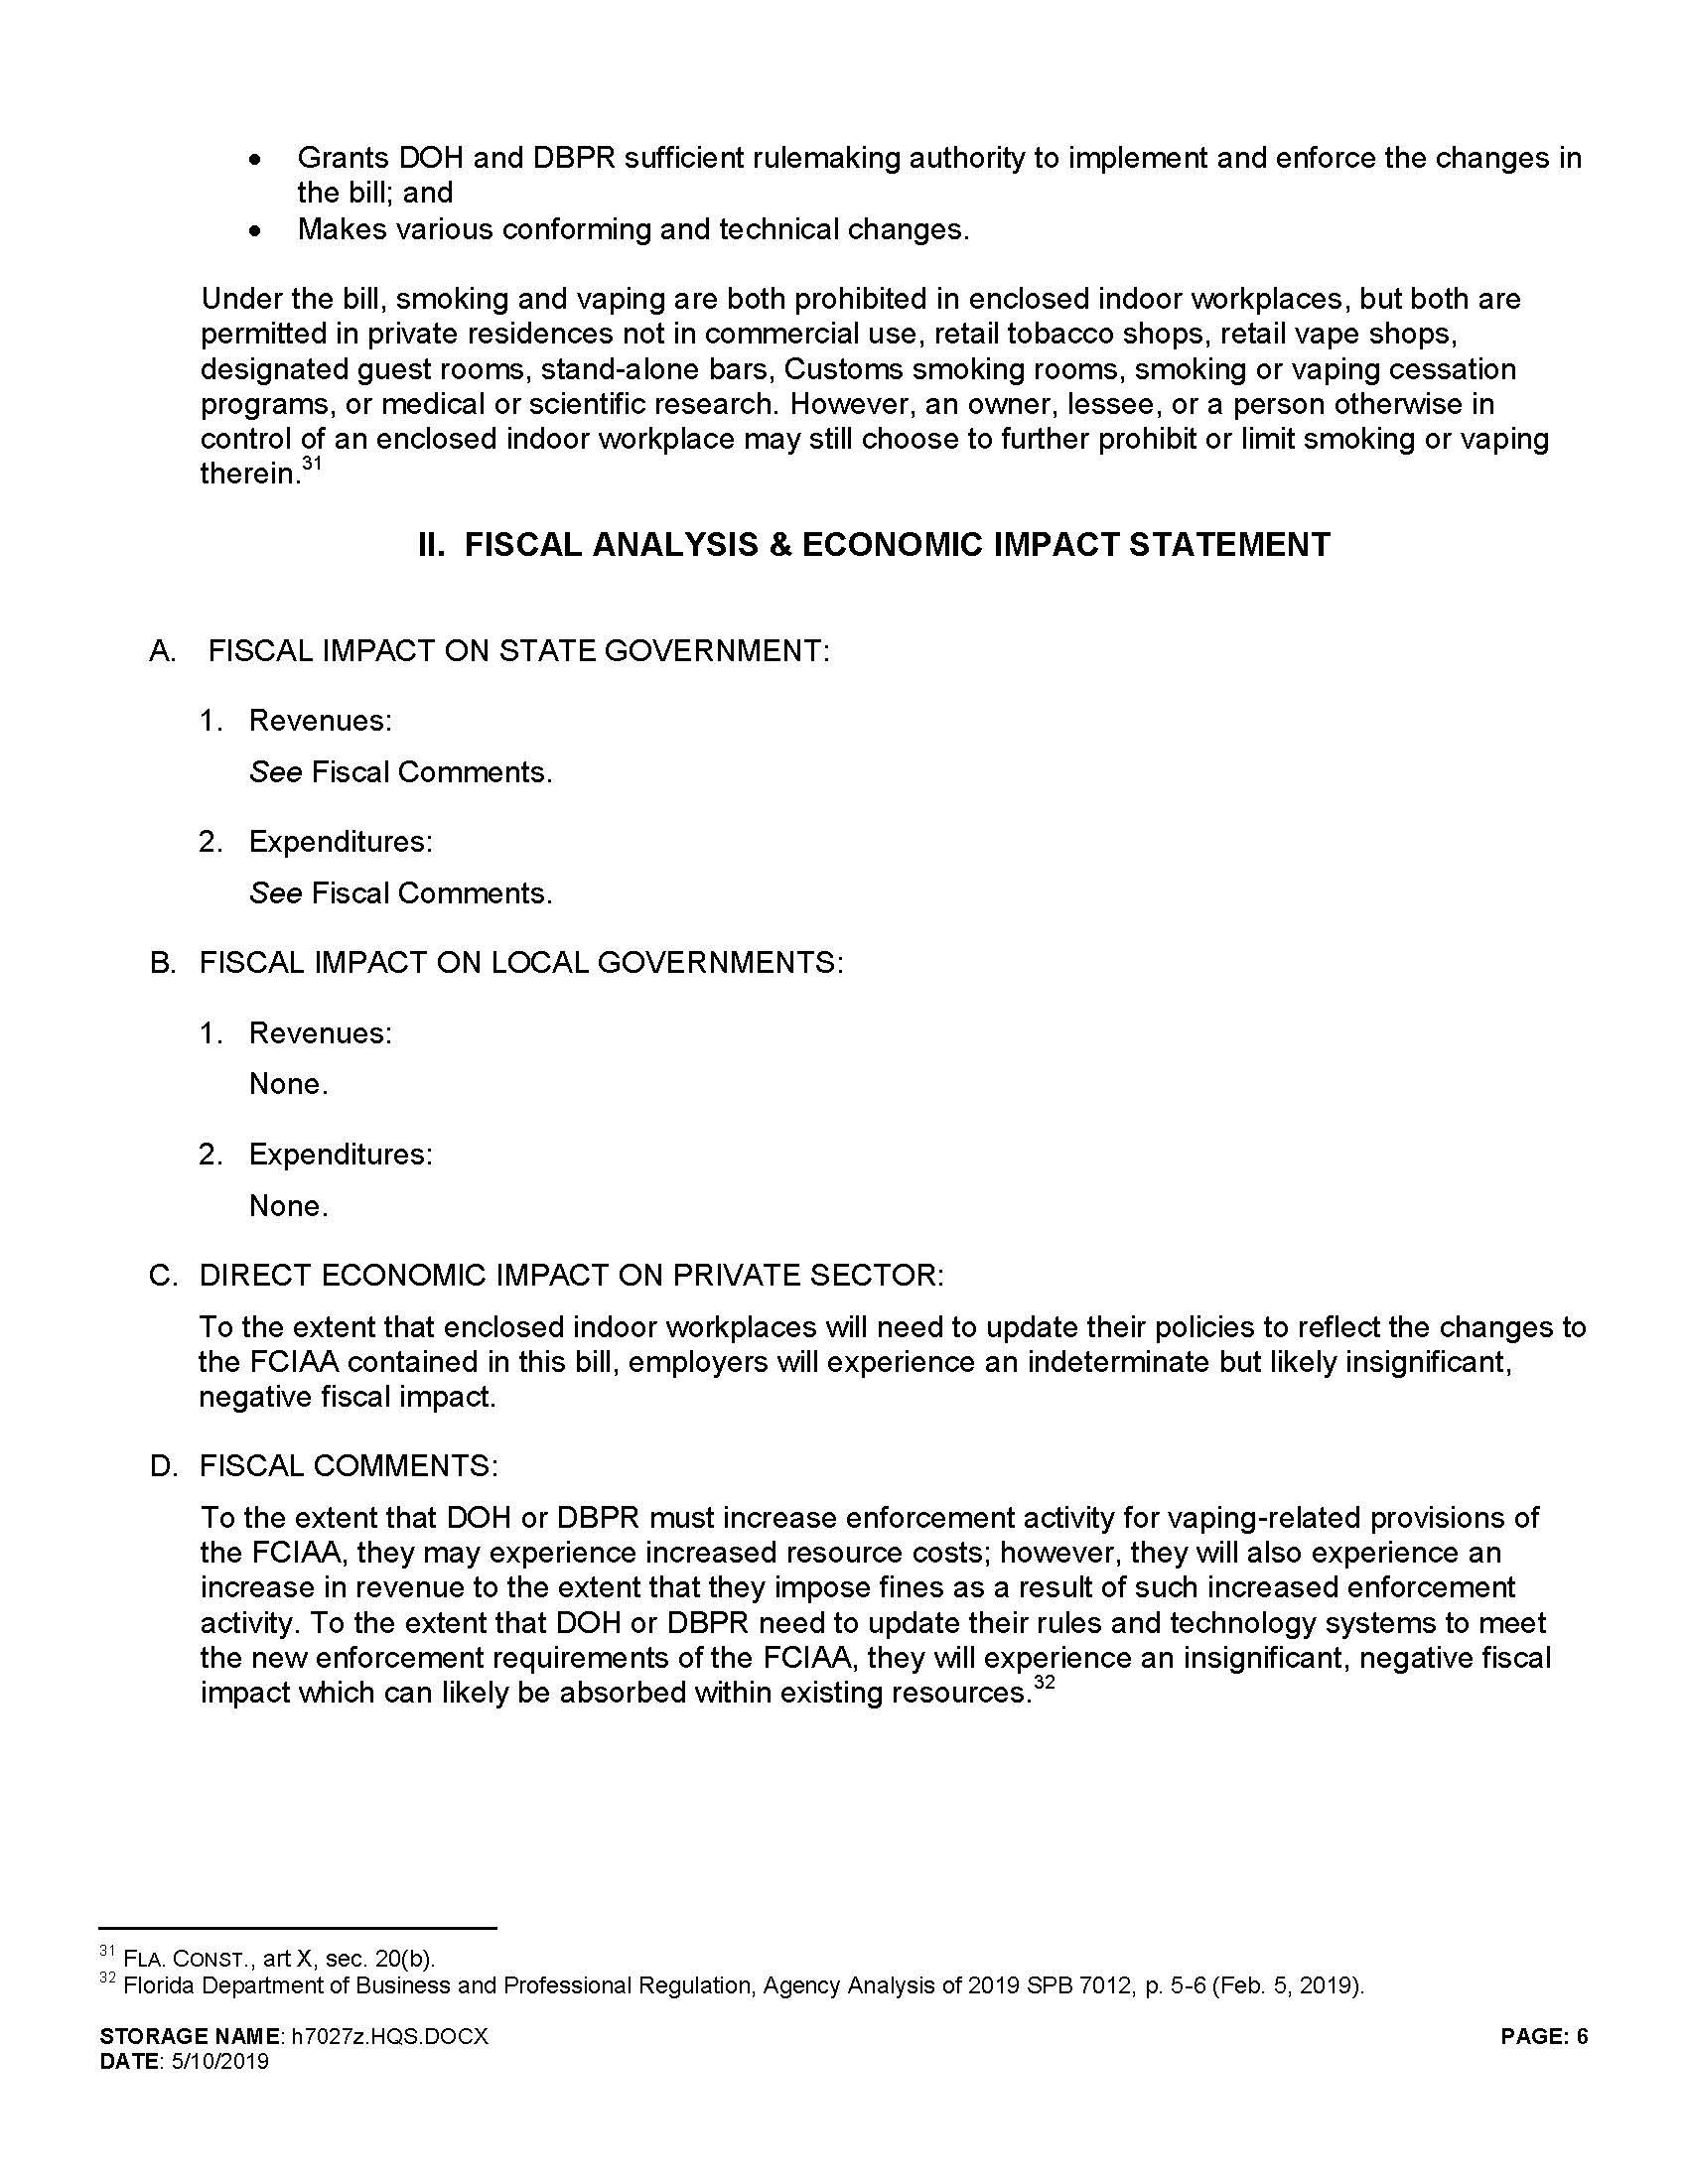 Vaping Bill - Final Analysis_Page_6.jpg